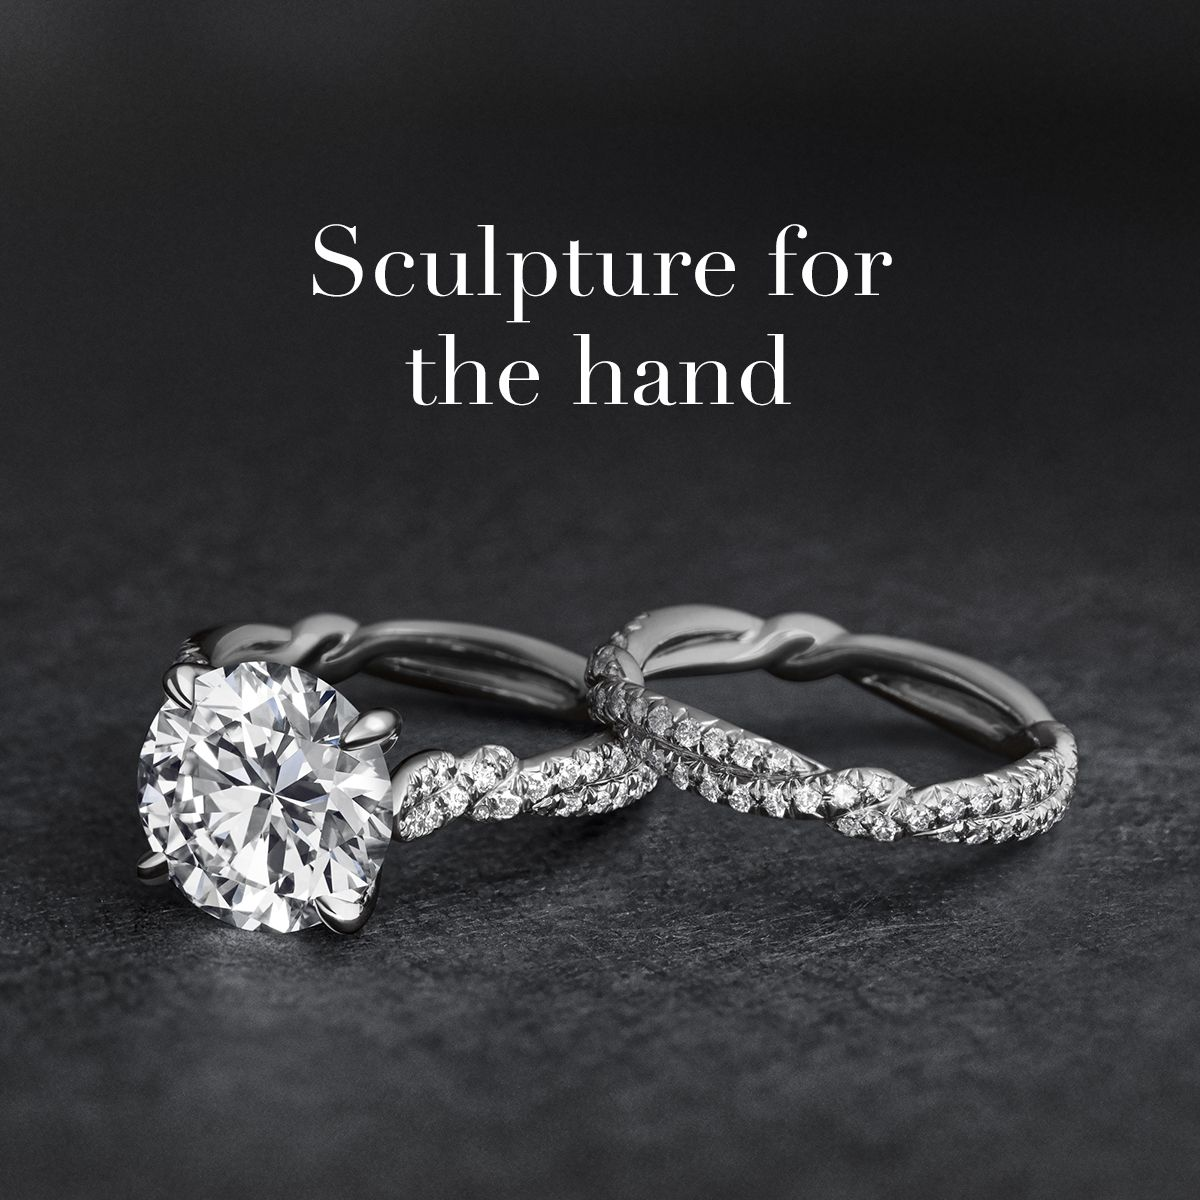 david yurman wedding rings David Yurman DY Wisteria rings in platinum